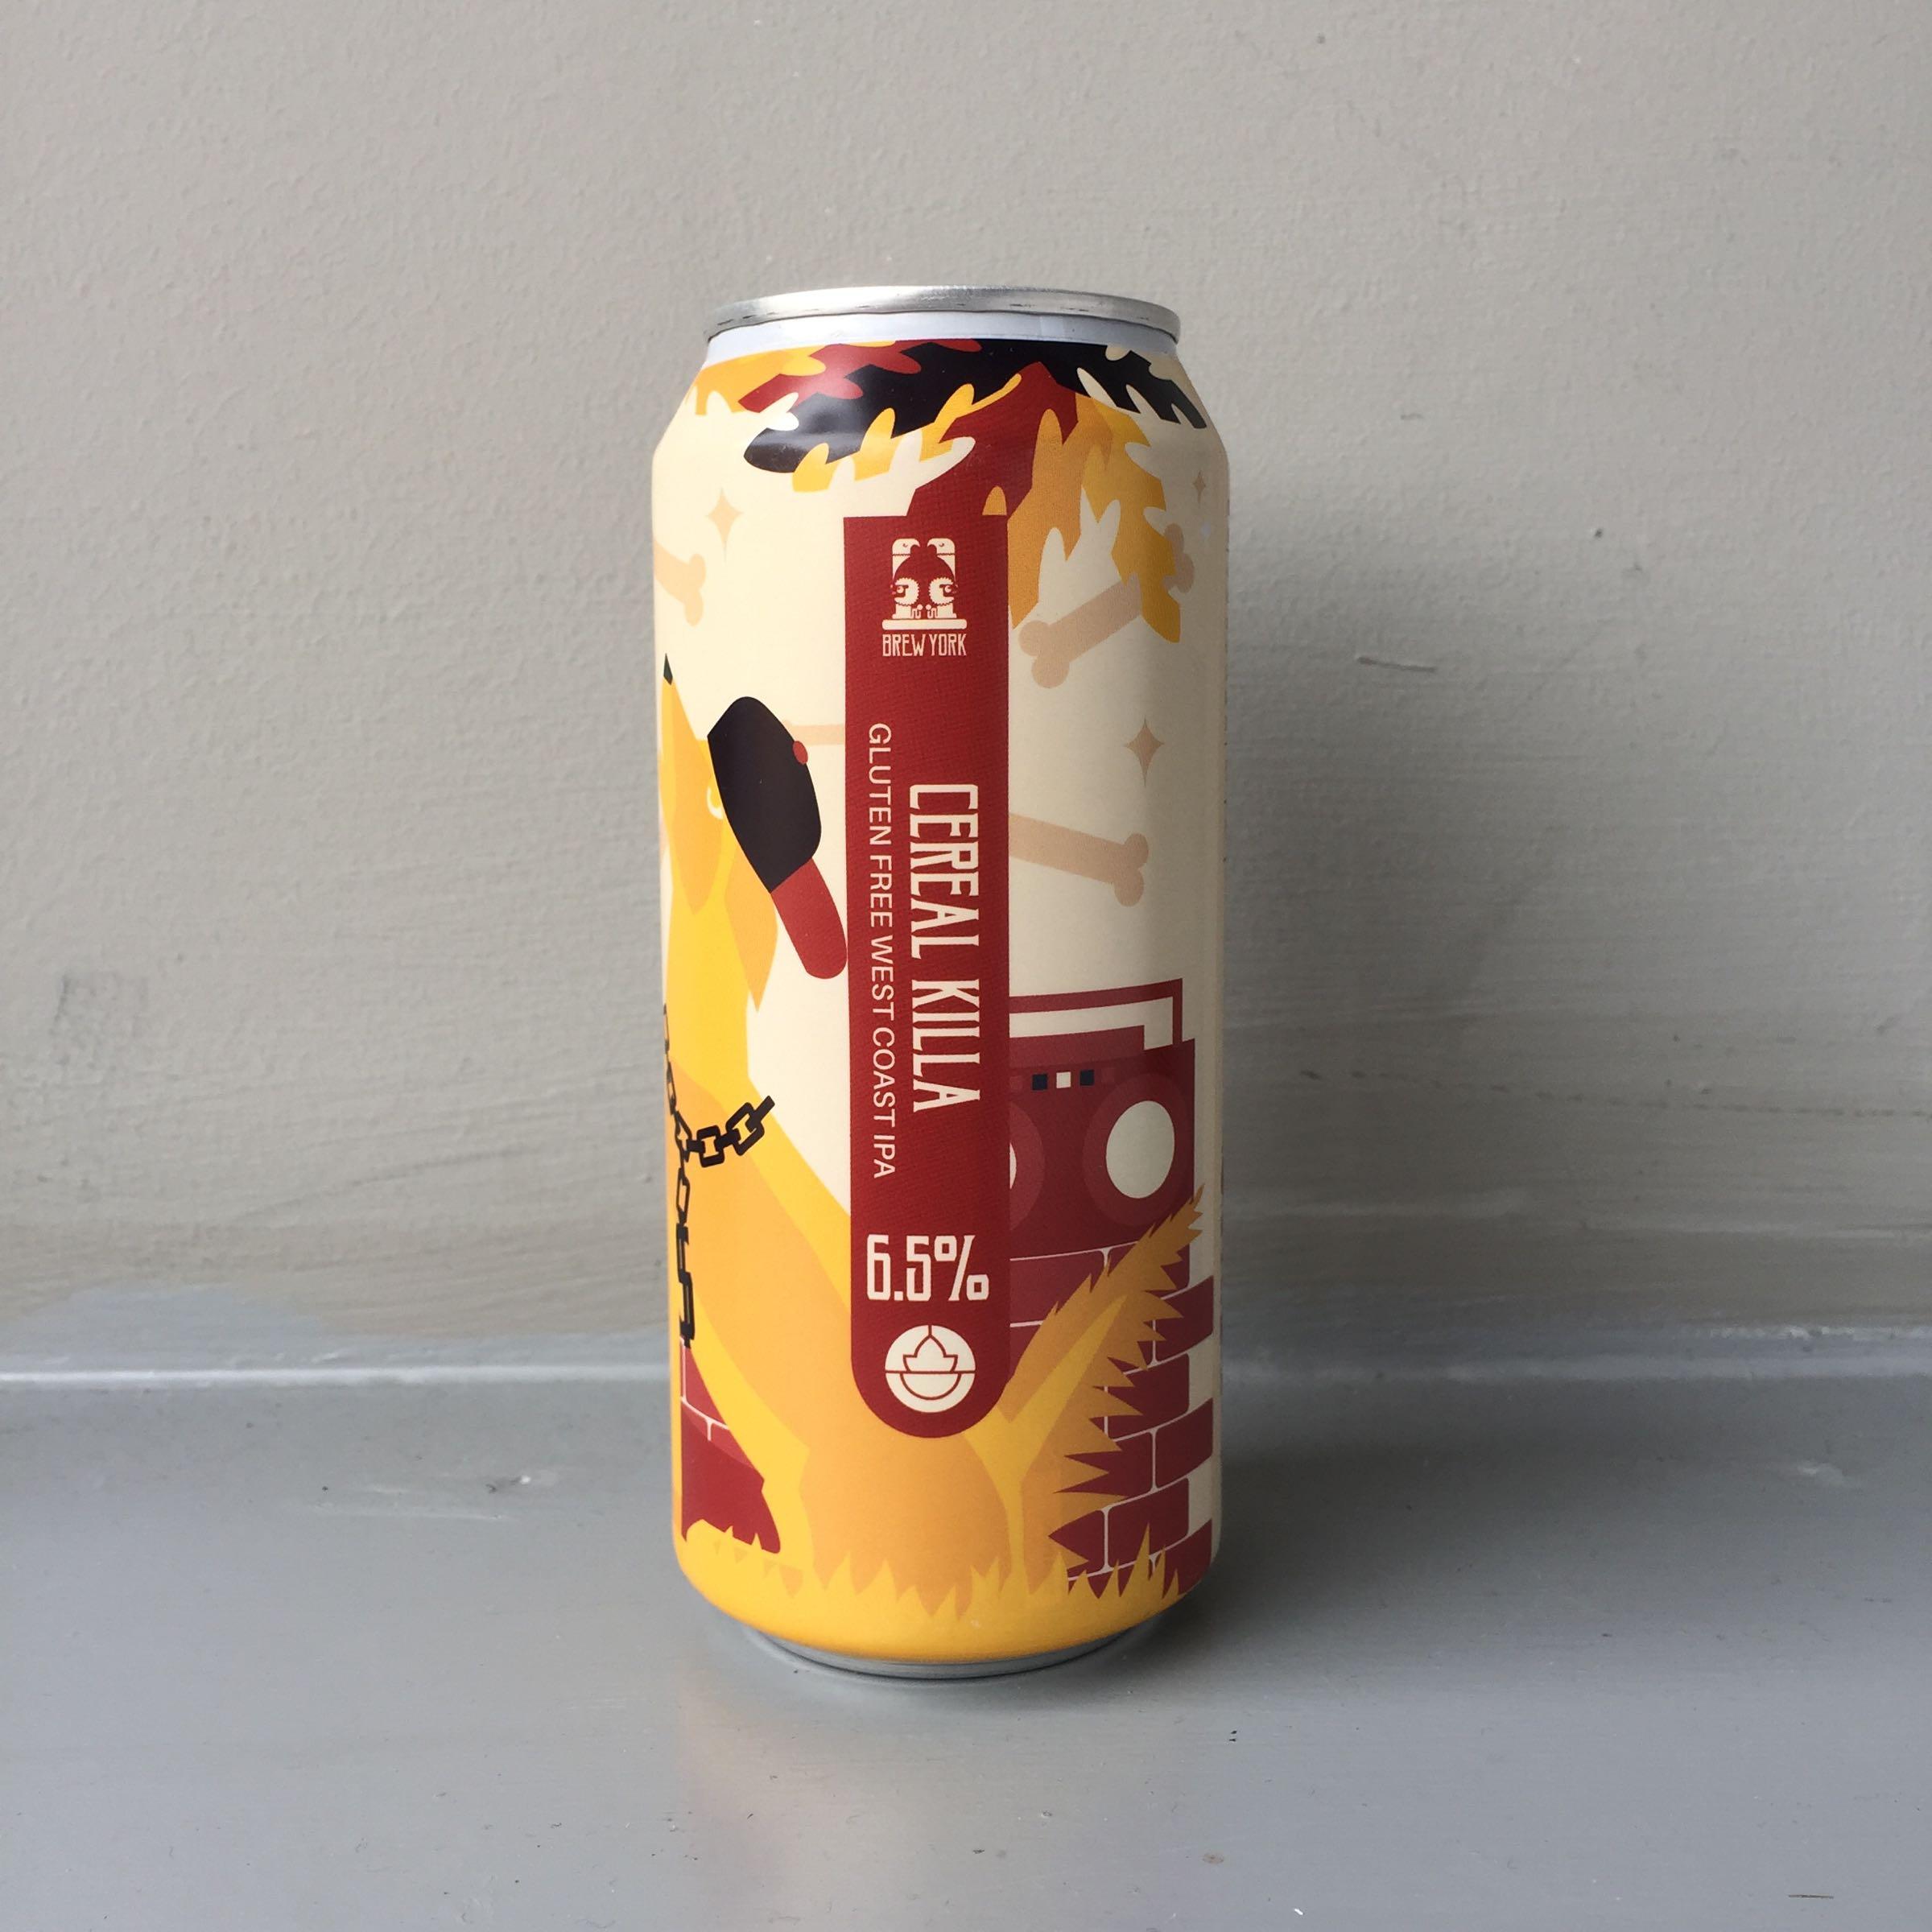 Brew York 'Cereal Killer' Gluten Free West Coast IPA 440ml 6.5% ABV